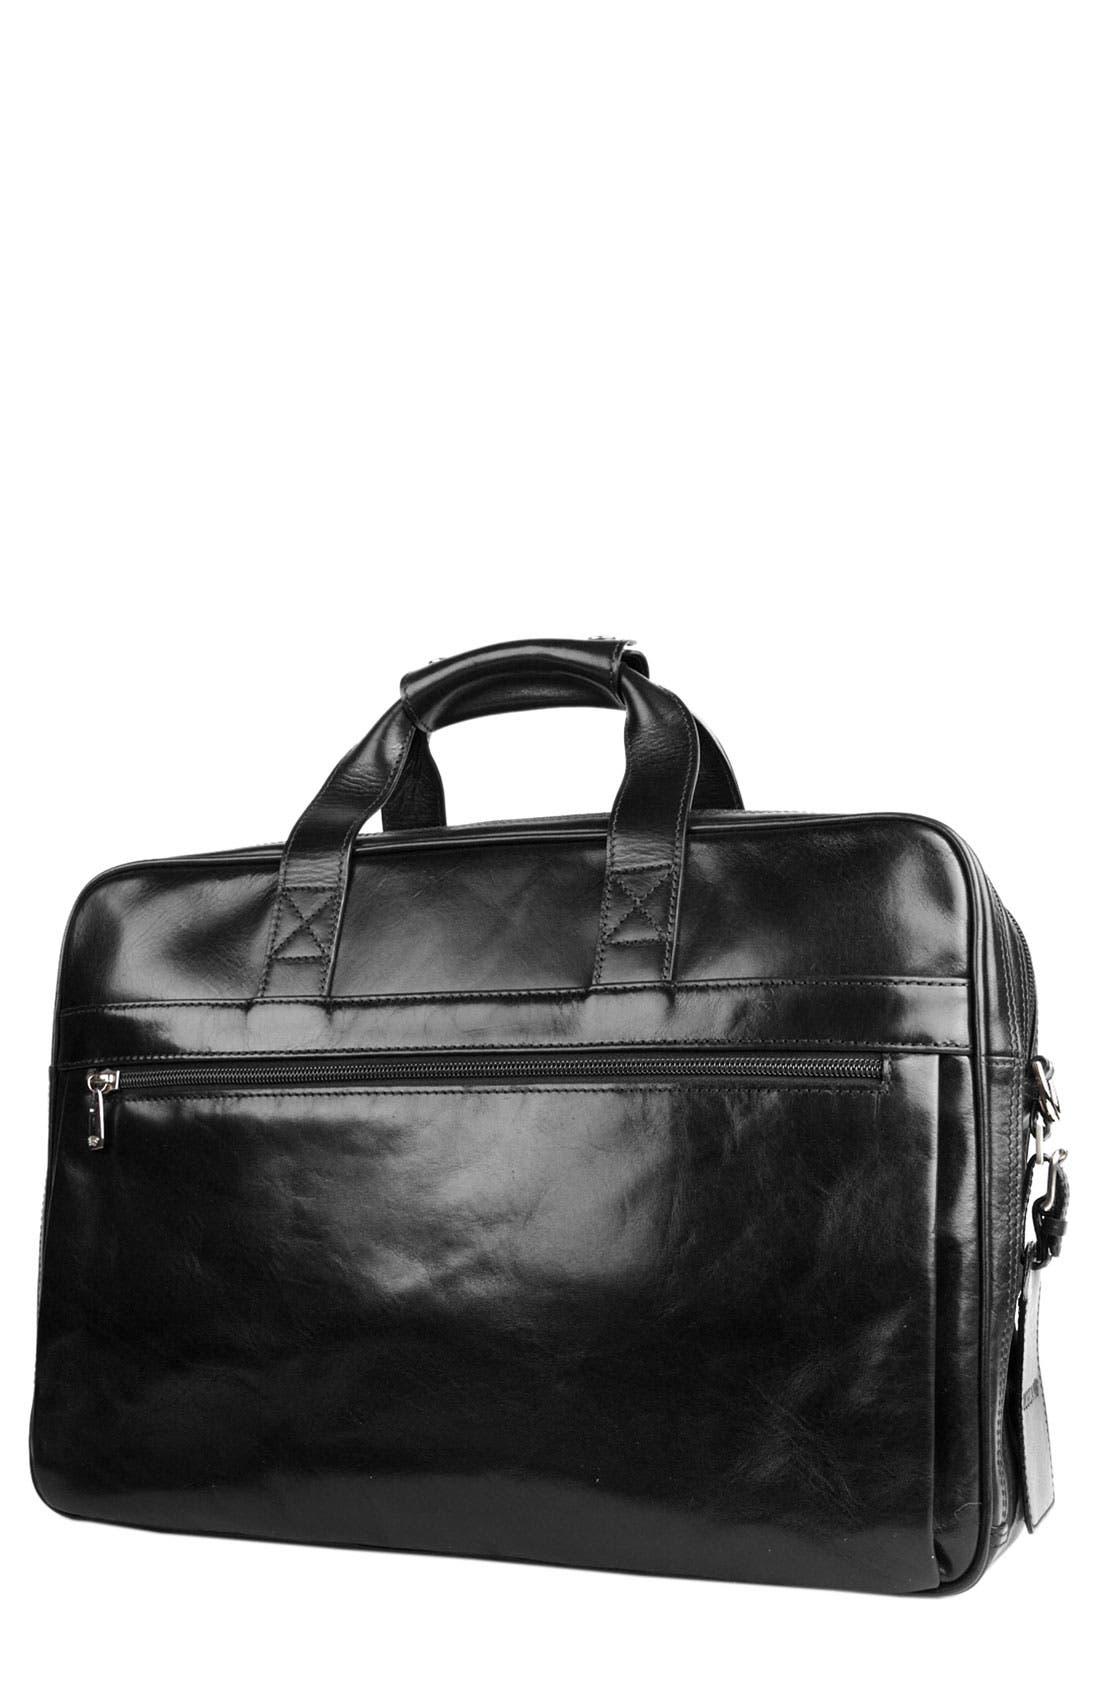 Double Compartment Leather Briefcase,                             Main thumbnail 1, color,                             Black